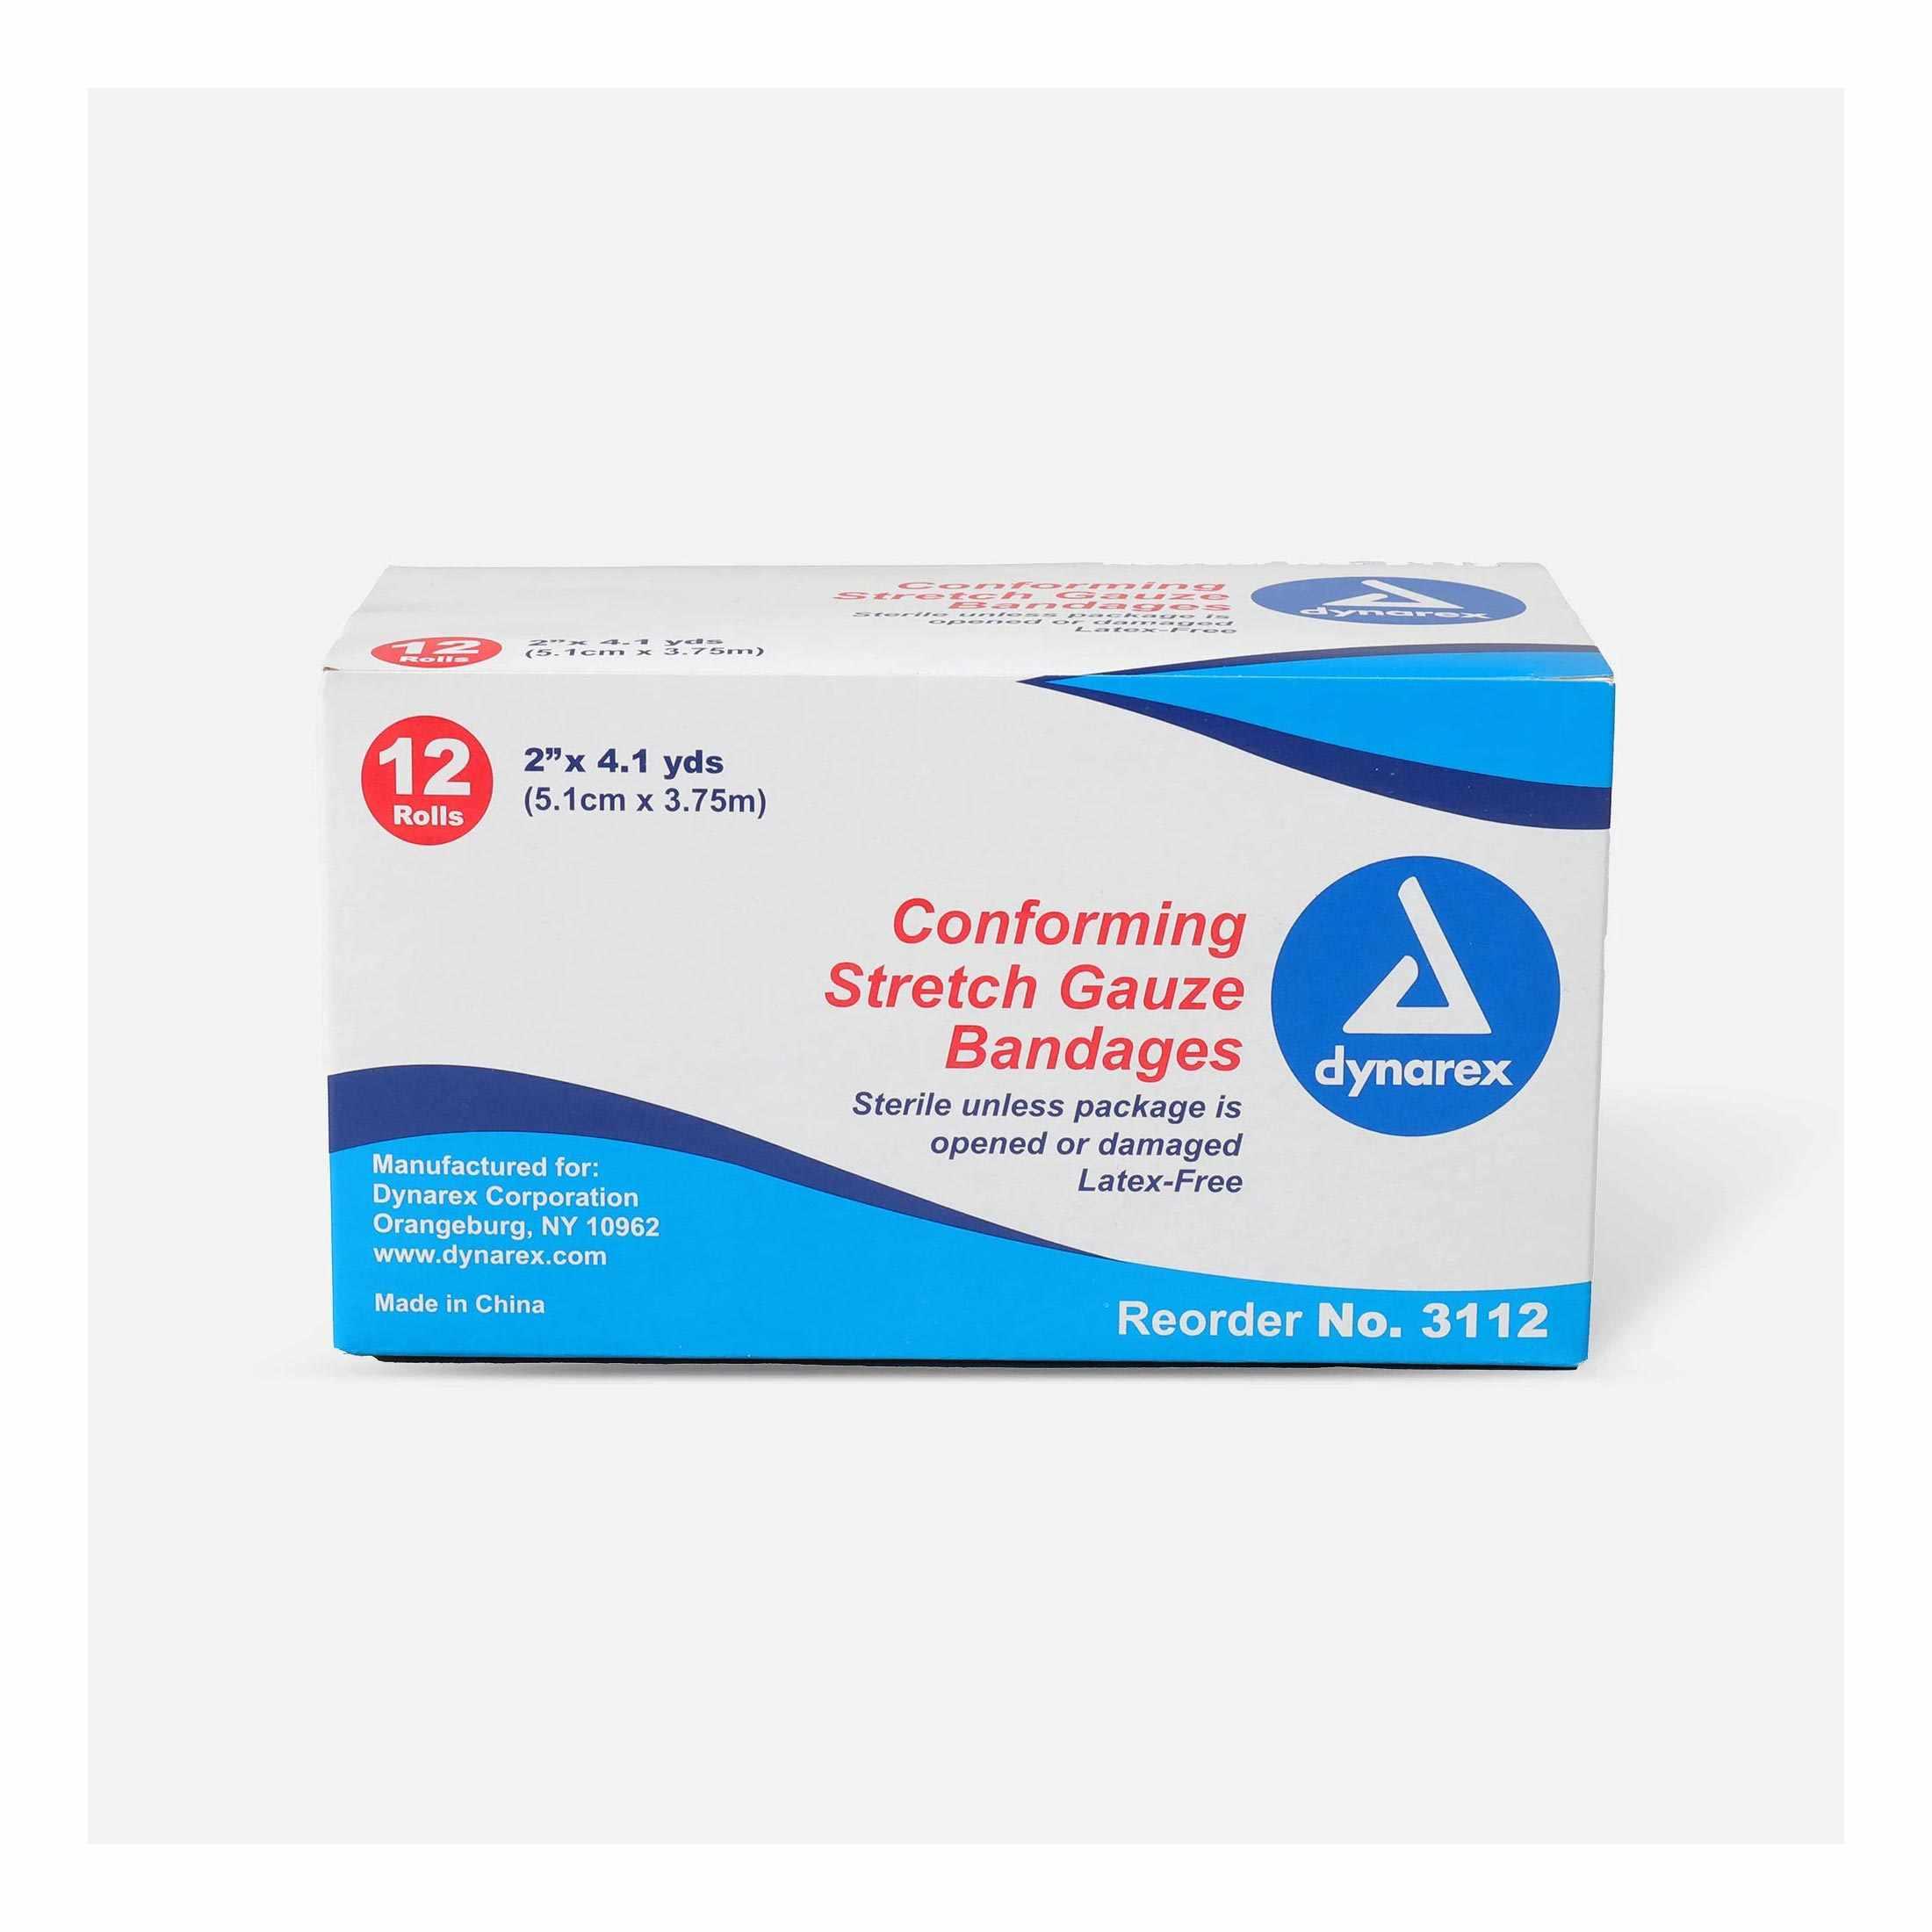 "Dynarex Self-Adhering Conforming Sterile Stretch Gauze Bandage, 2"" x 4-1/10 yards"